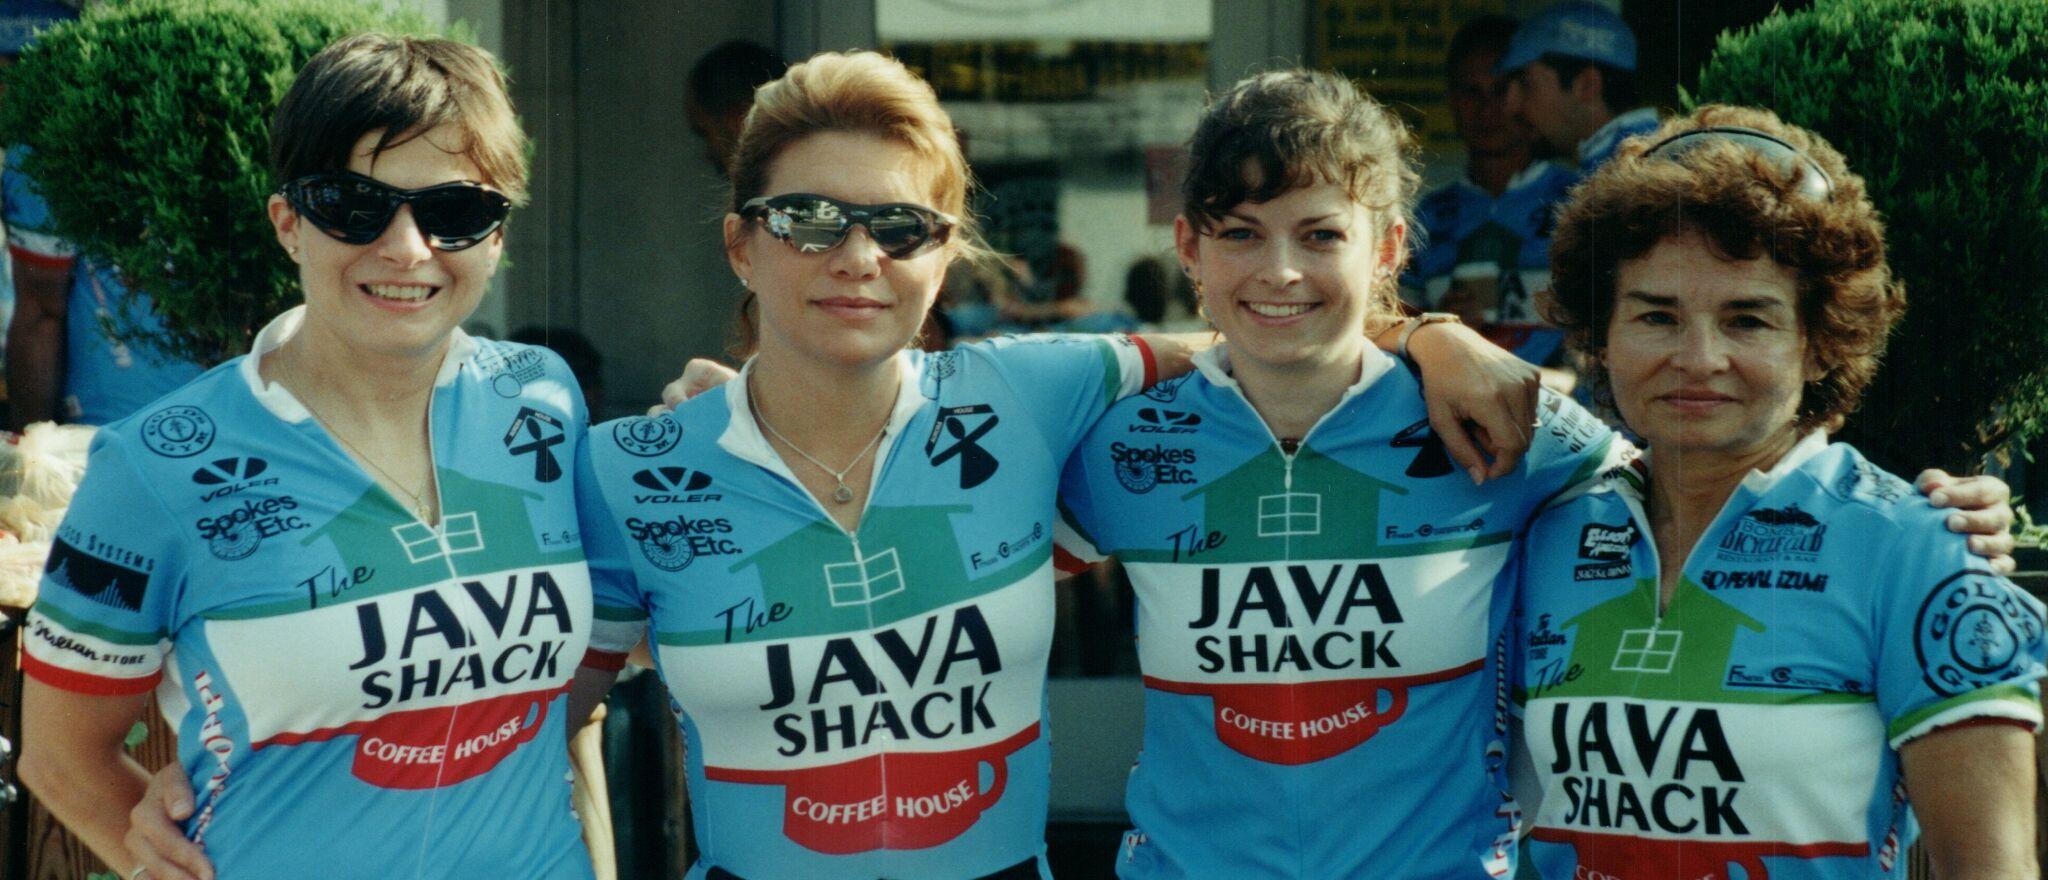 1998 Womens team Carol Fonseca Lisa DiCarlo Kimberly Meyer Linda Chapman.jpg